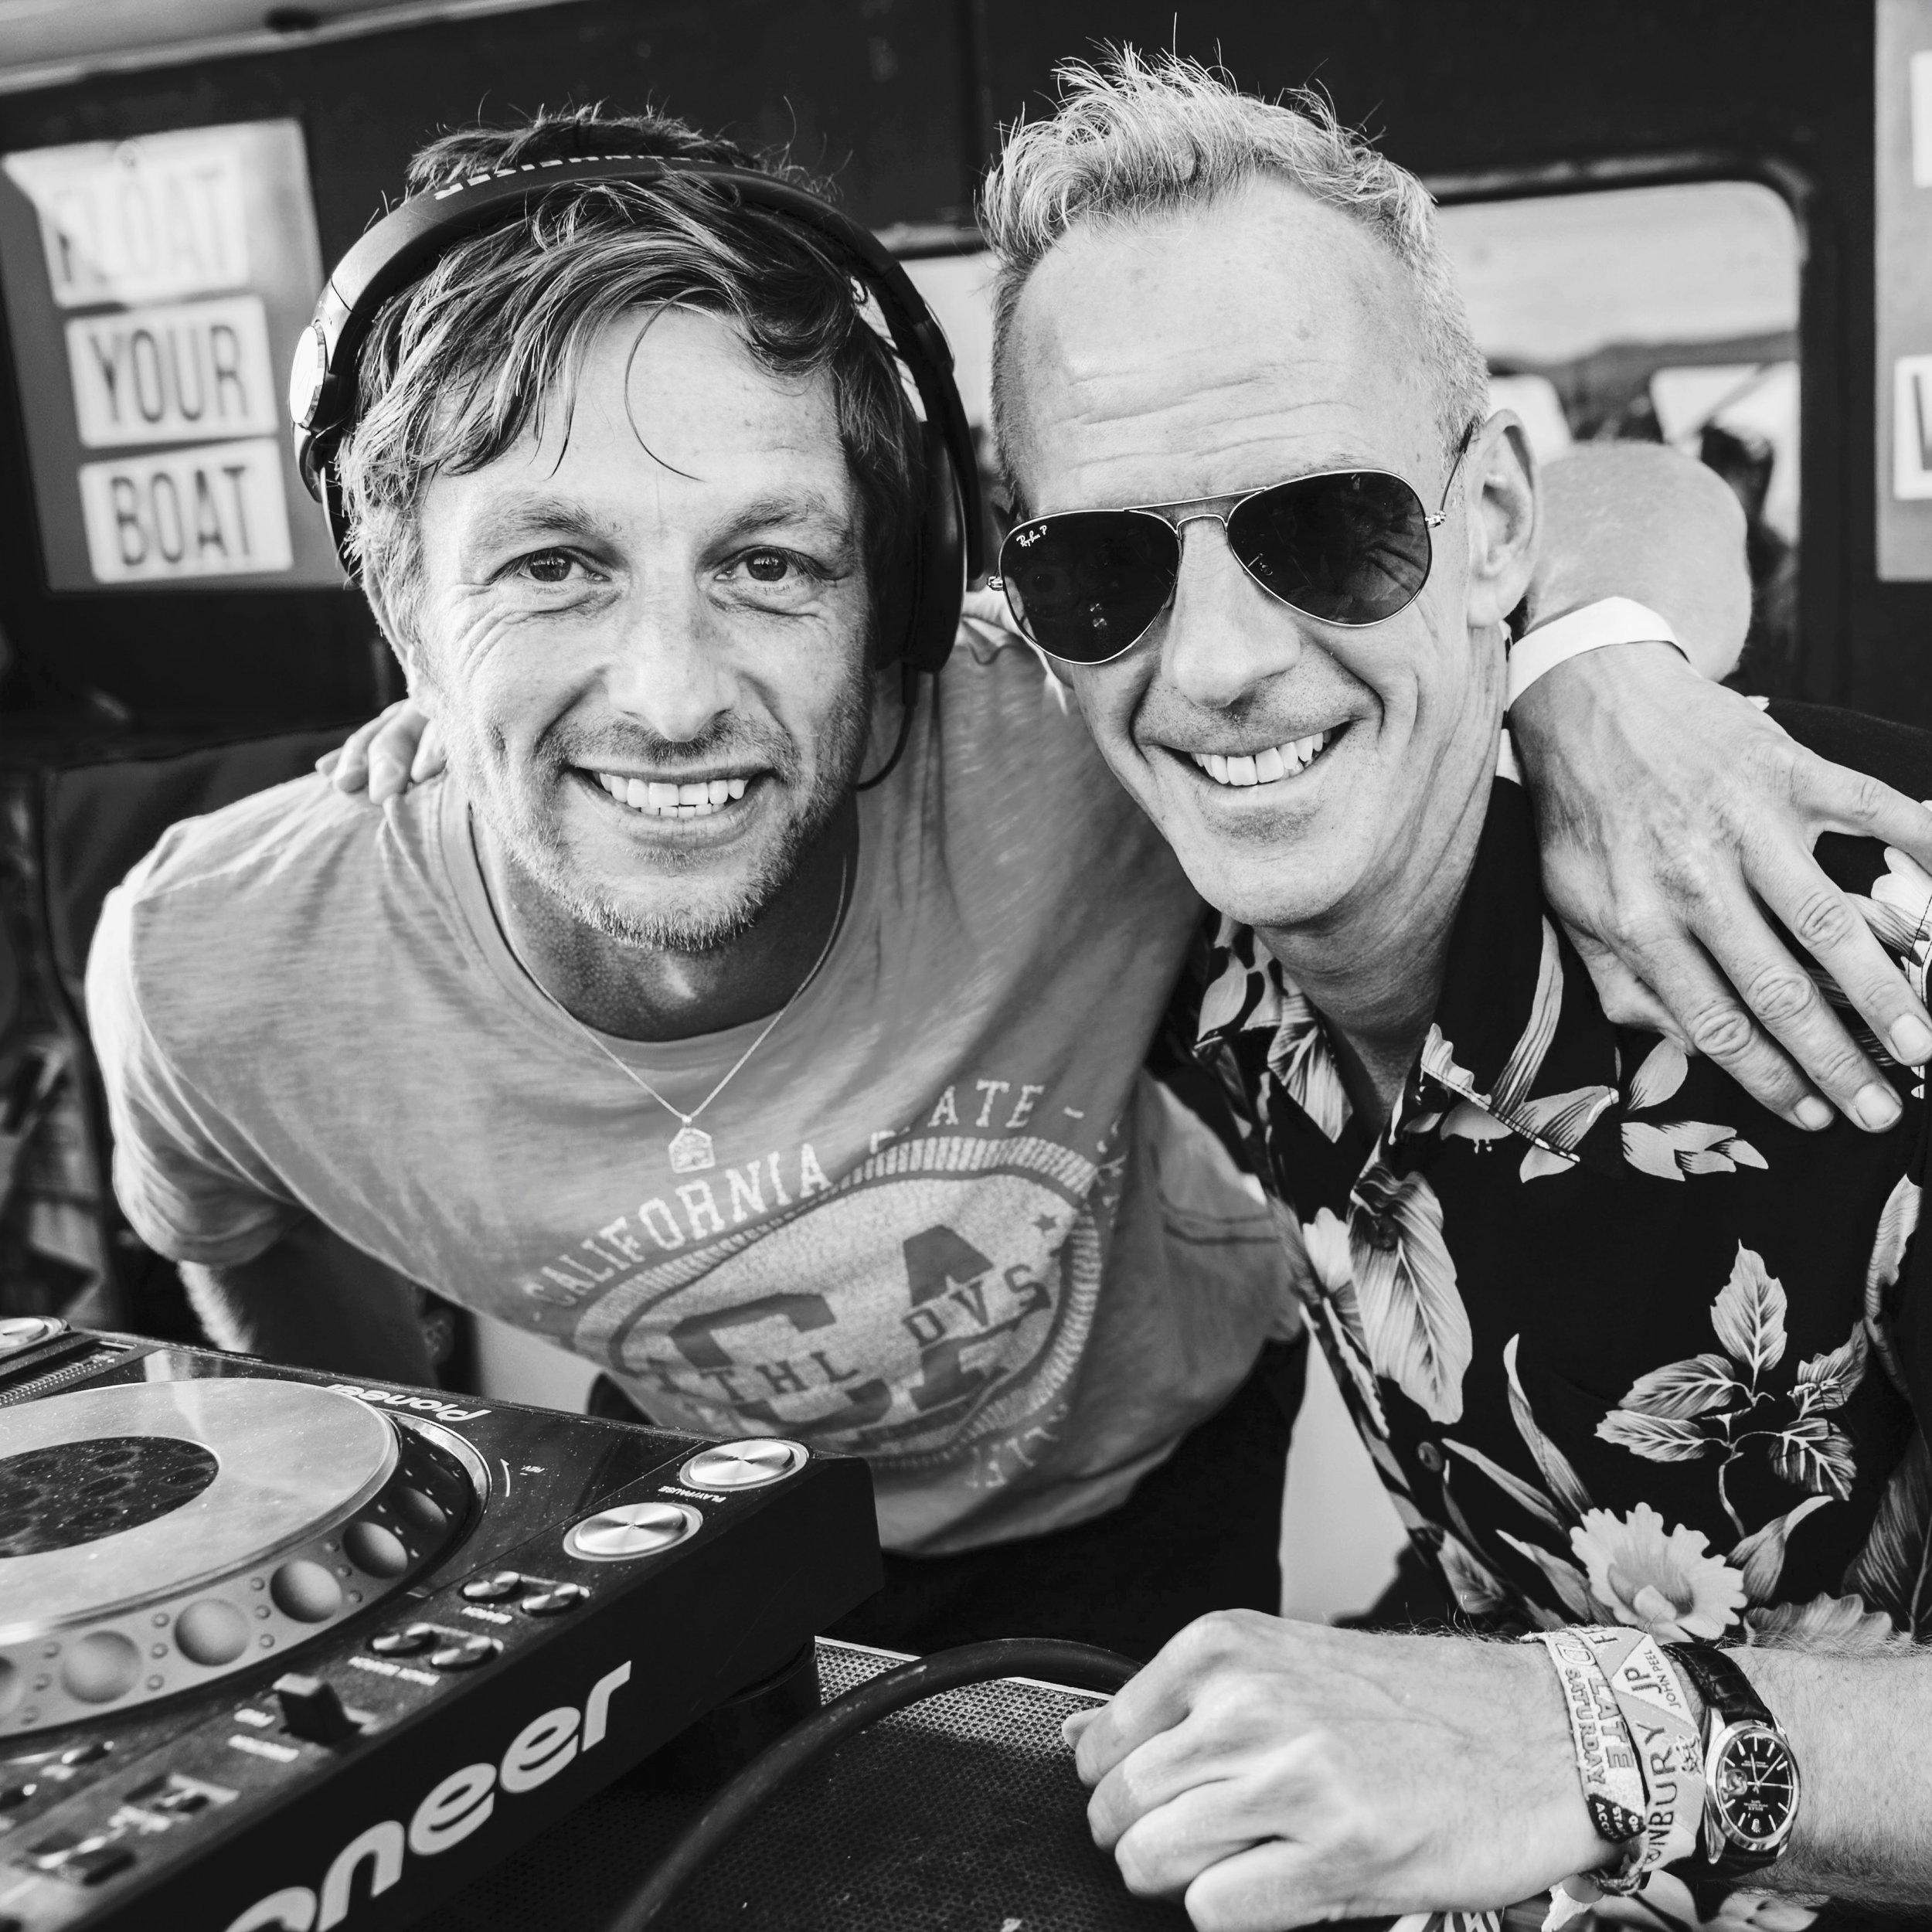 The Juke & Fatboy in Ibiza